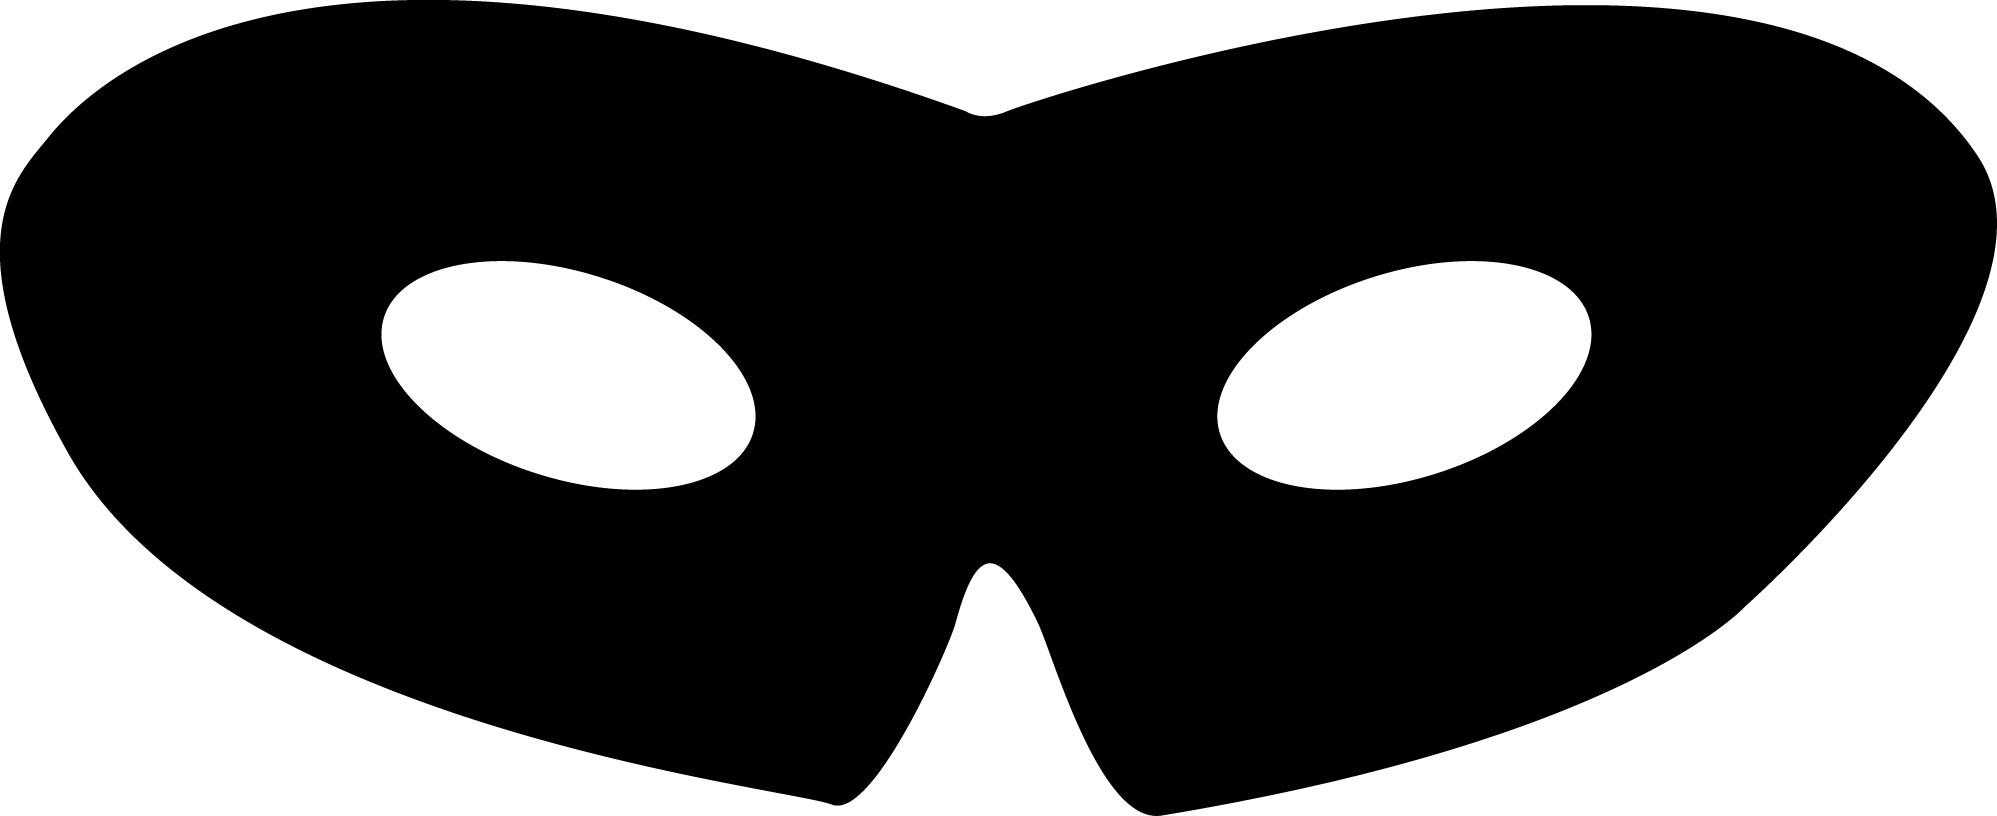 Mask clipart burglar. Free rogue cliparts download